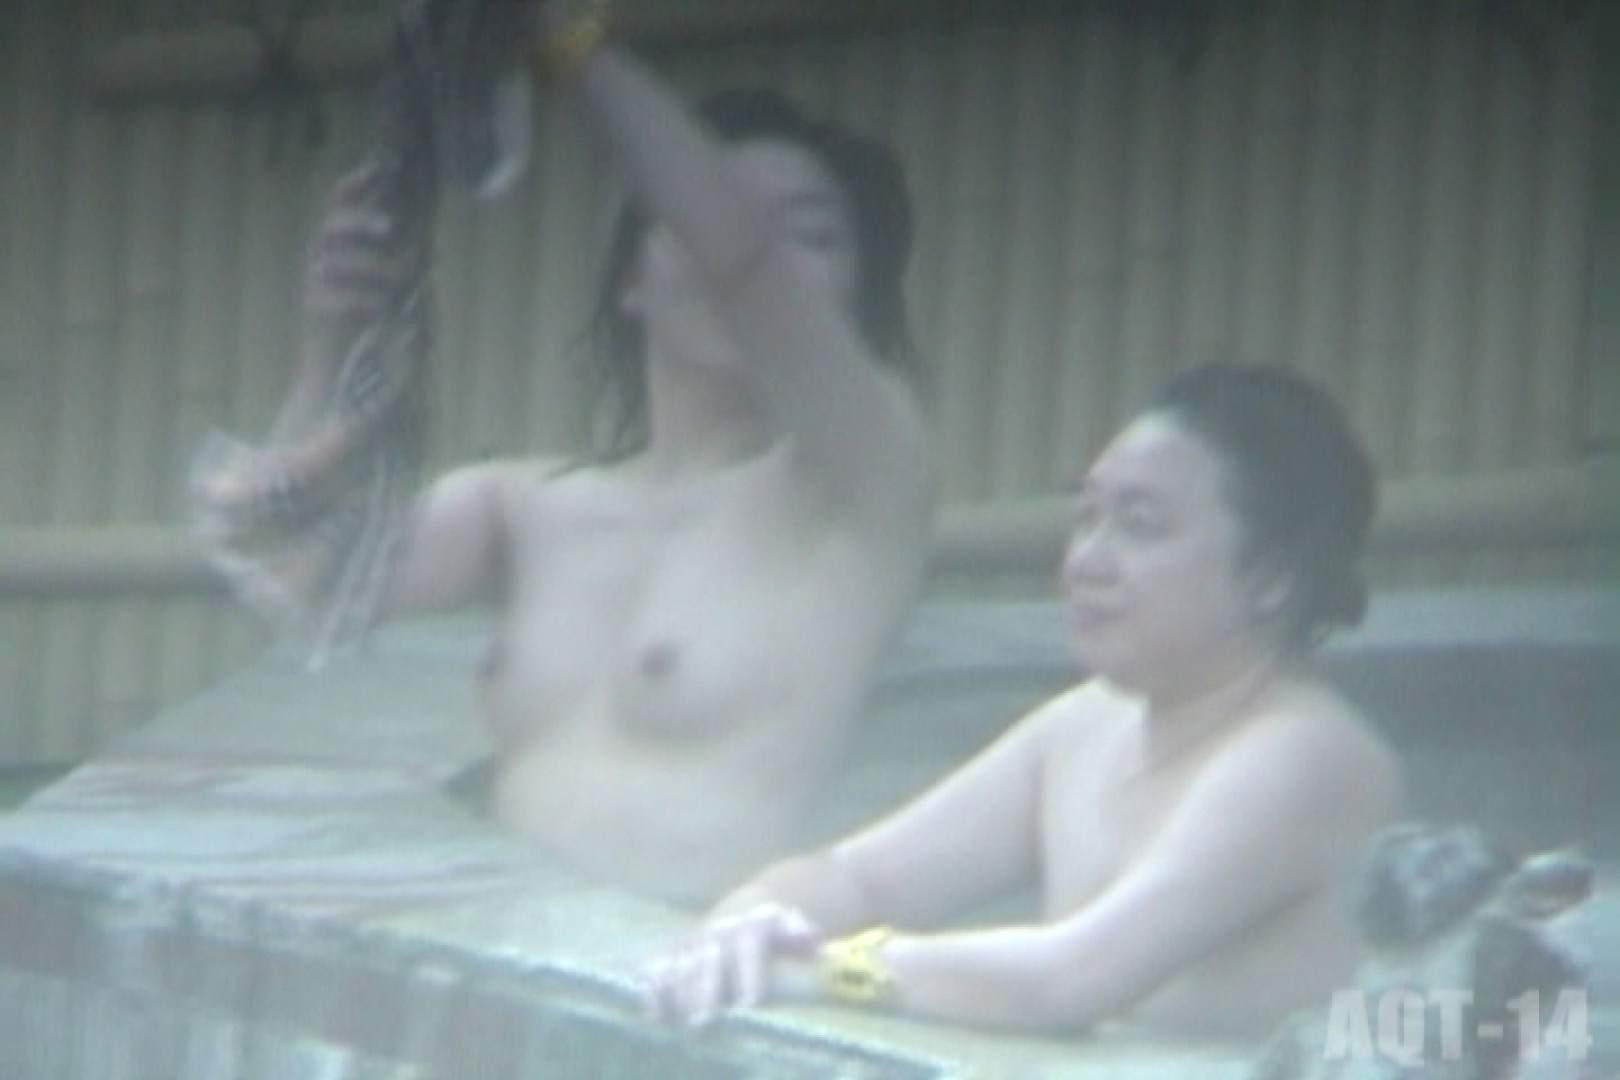 Aquaな露天風呂Vol.830 露天   HなOL  101pic 70